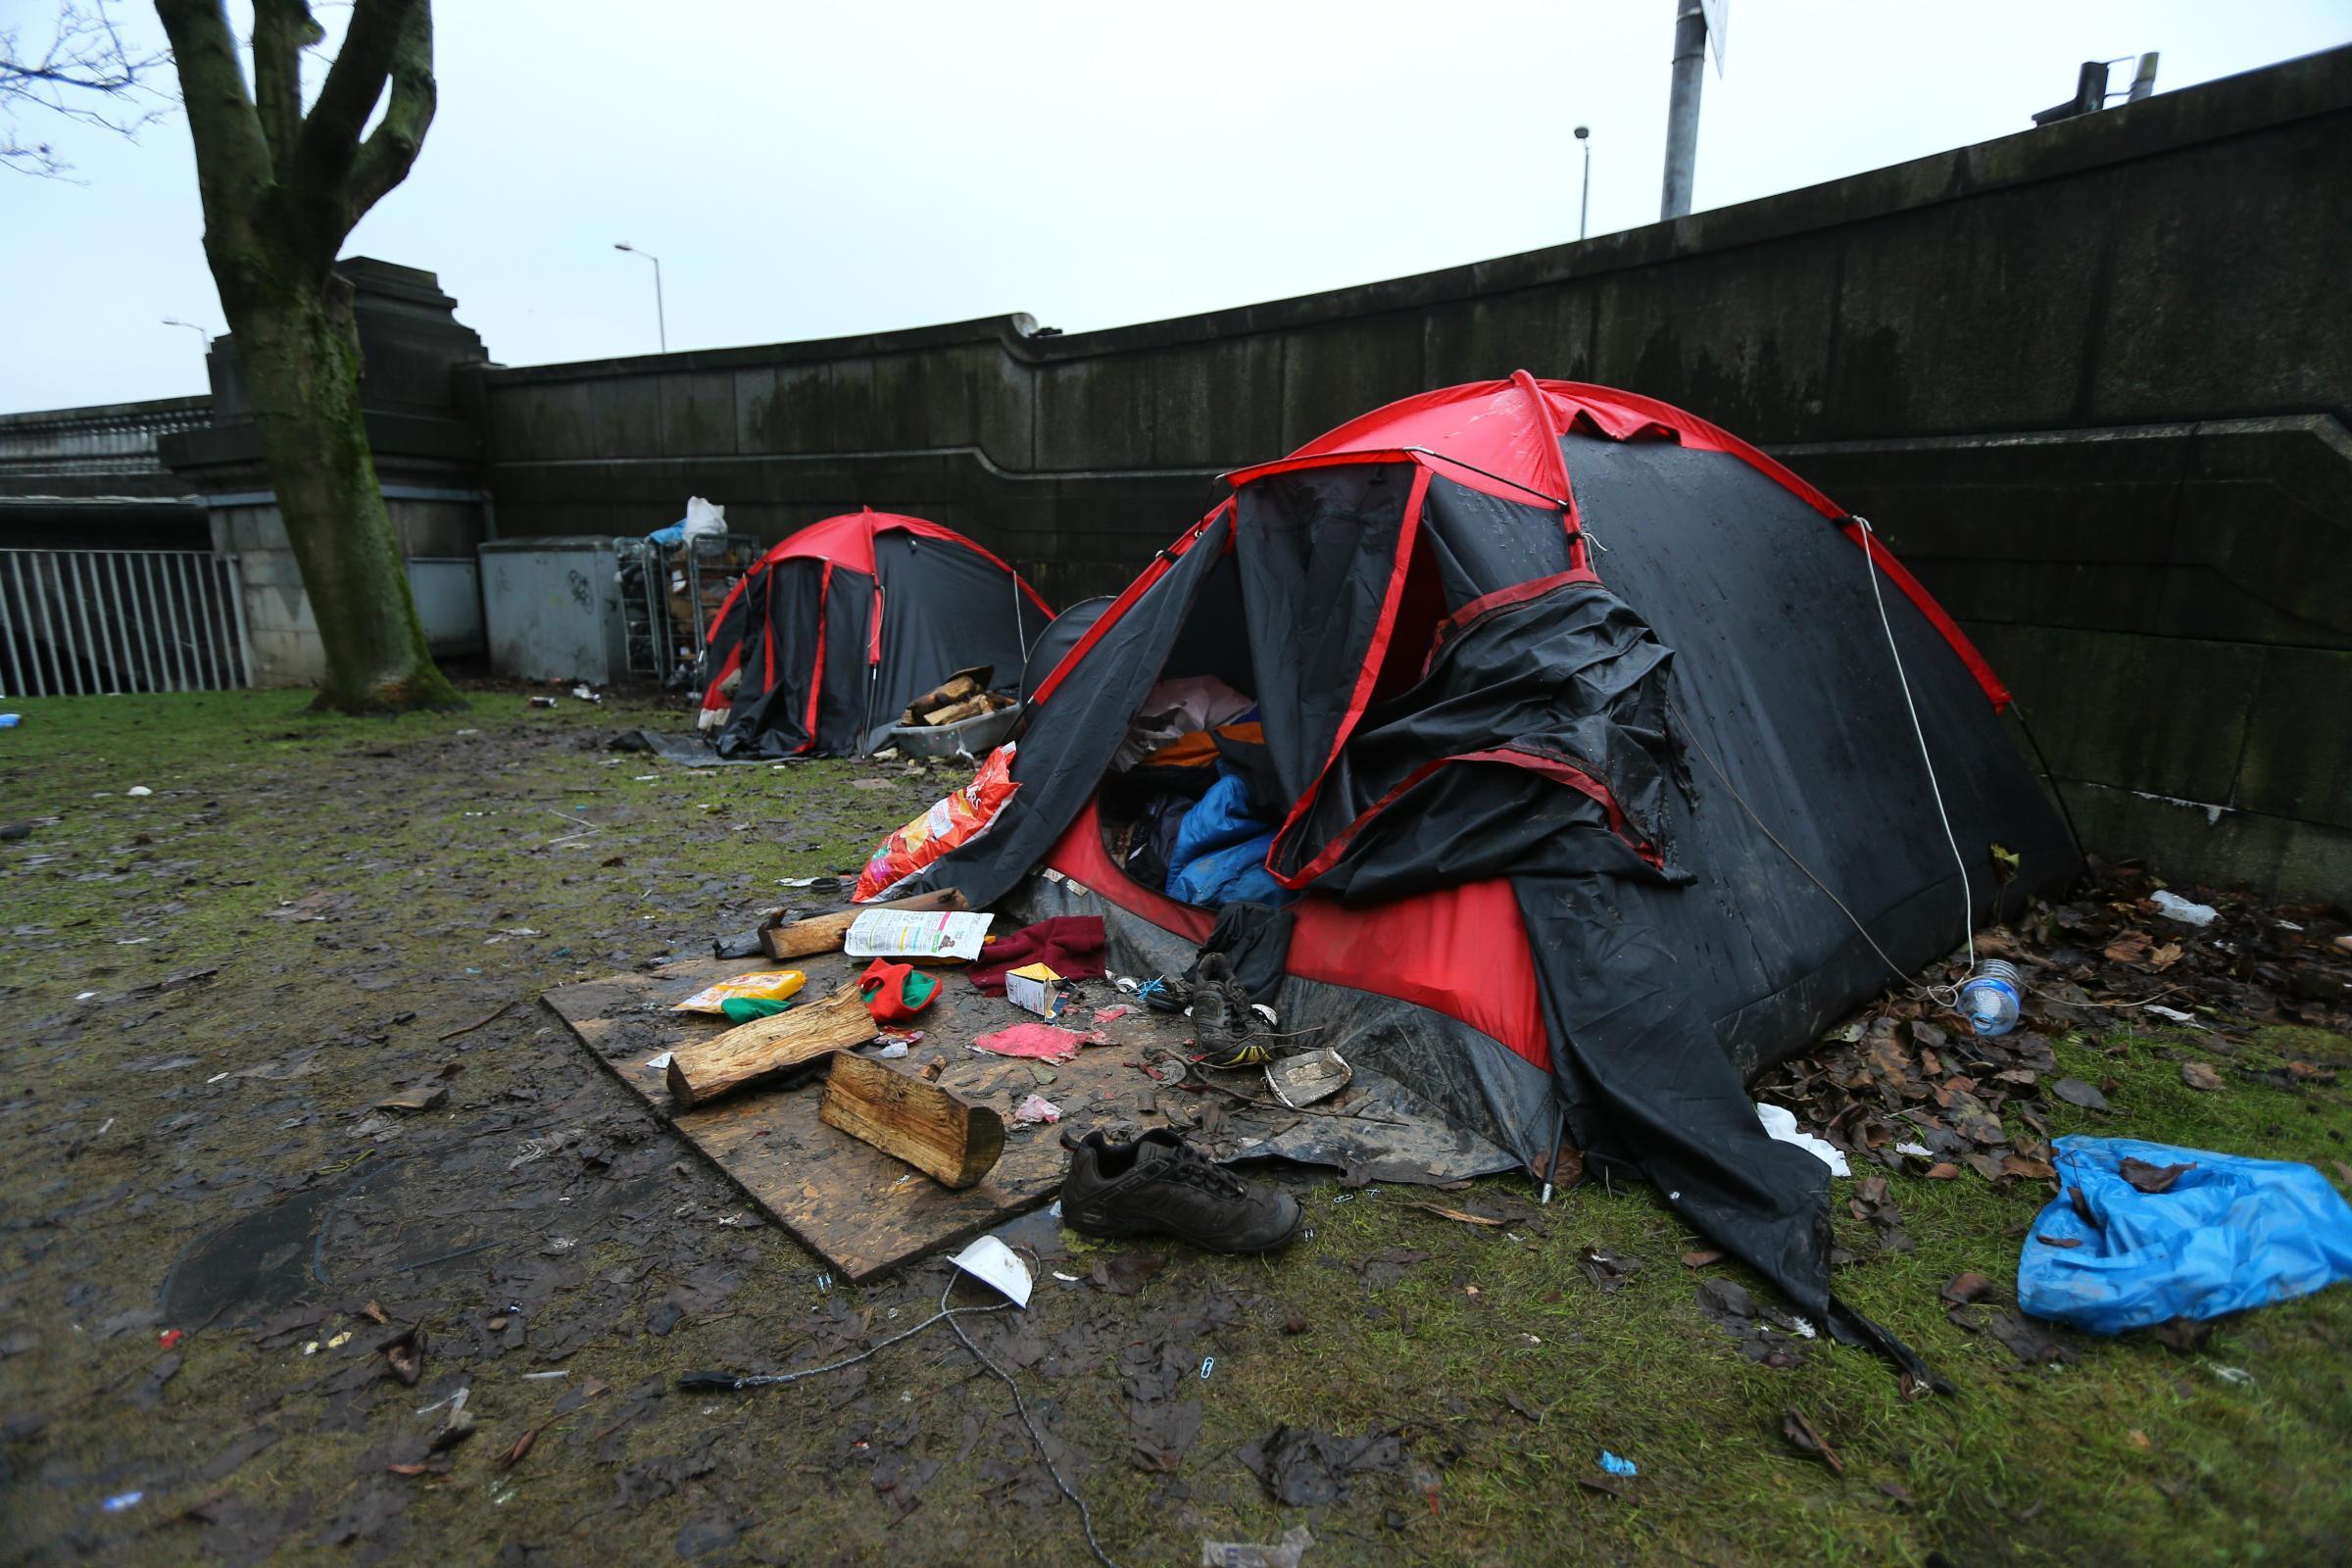 Storm over homeless tent u0027villageu0027 at Glasgow bridge site & Storm over homeless tent u0027villageu0027 at Glasgow bridge site ...